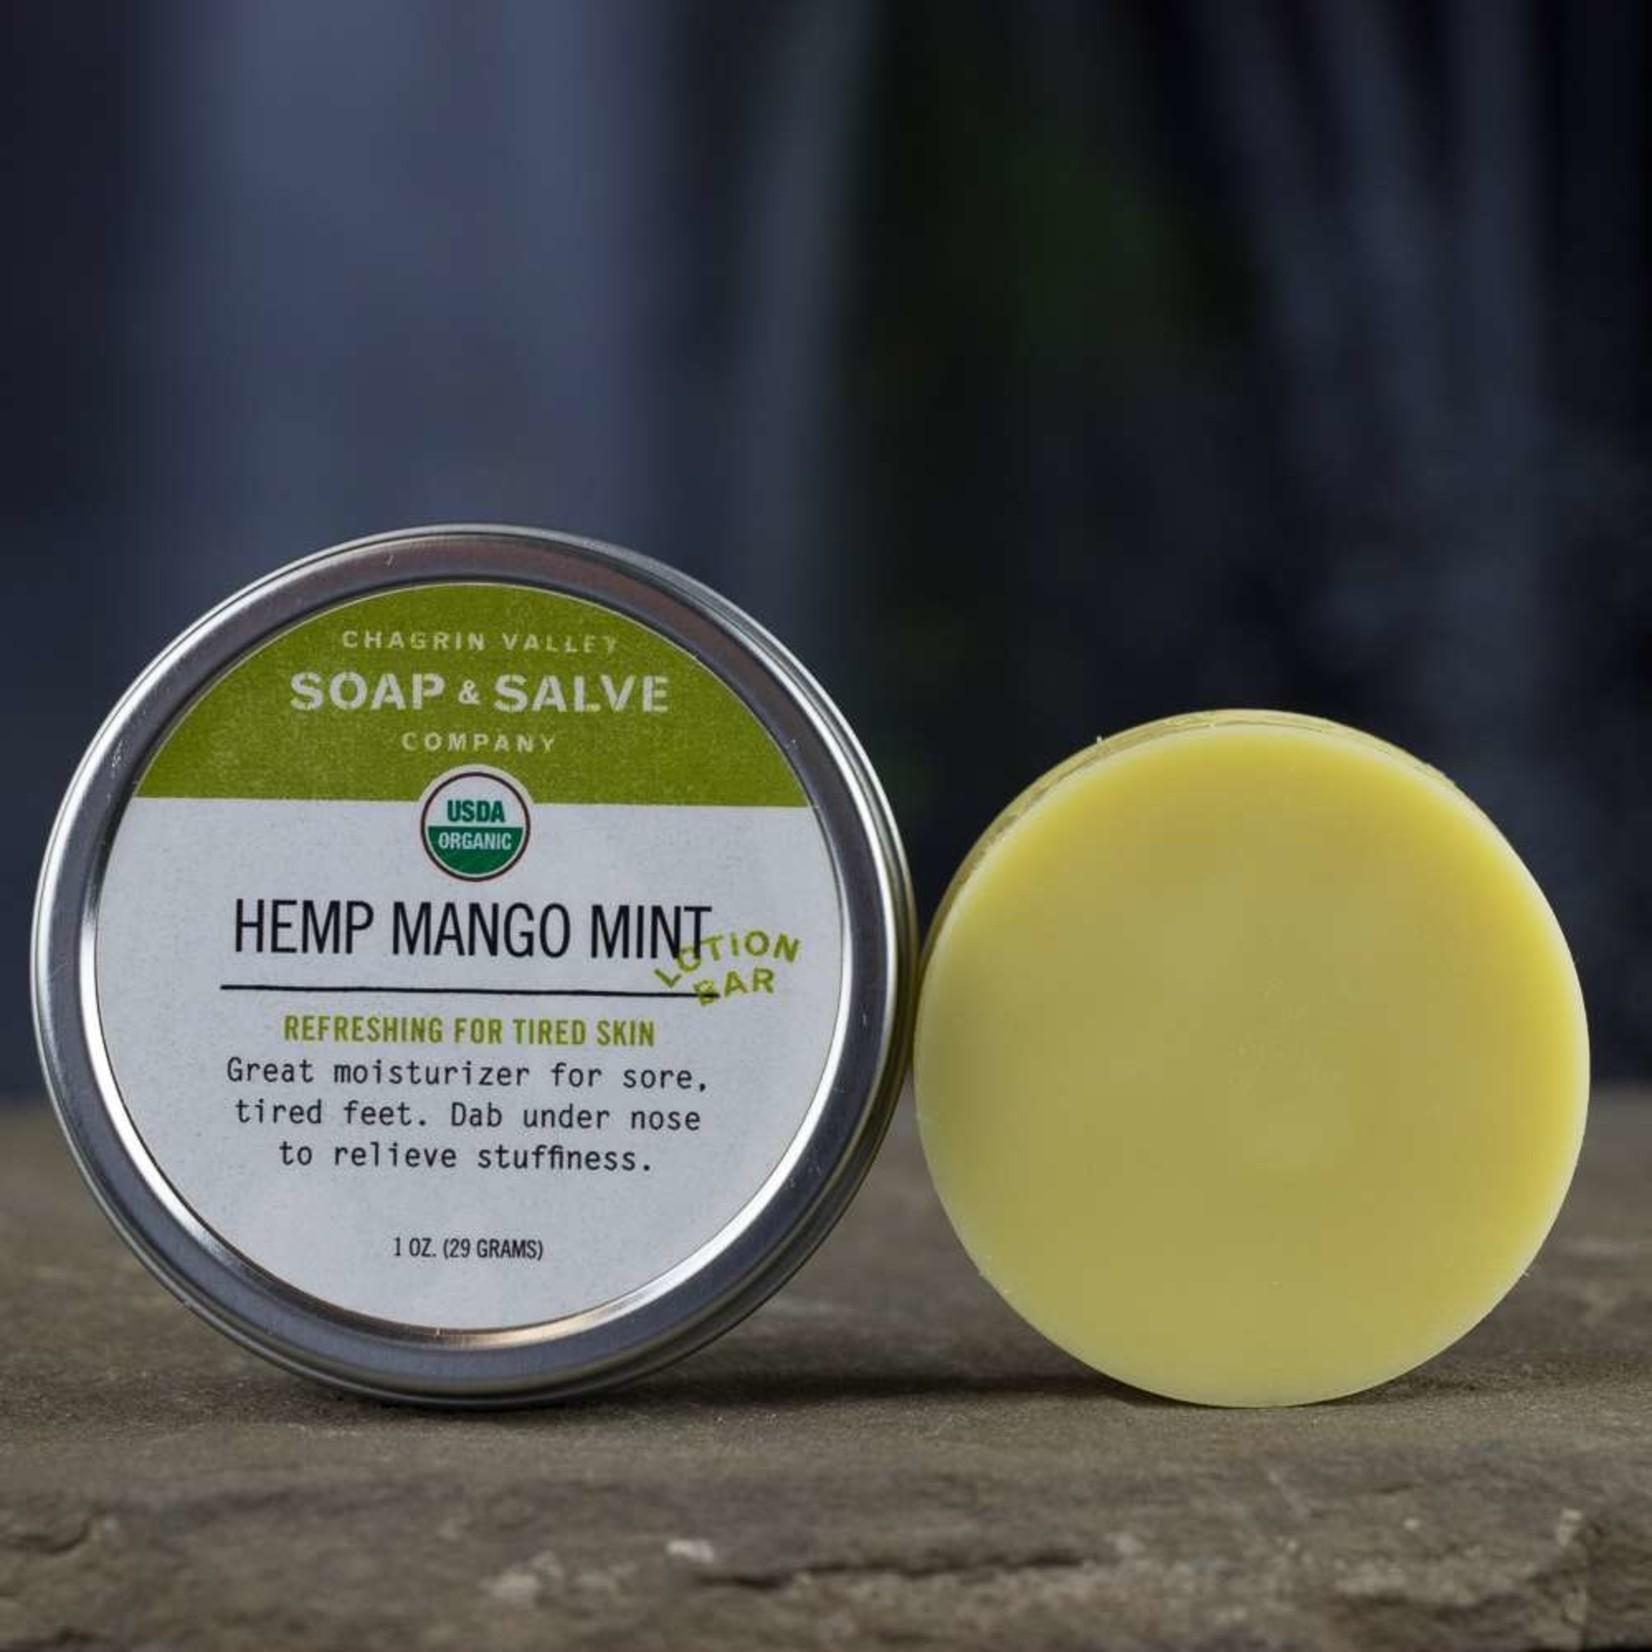 Chagrin Valley Soap and Salve Hemp Mango Mint Lotion Bar 1oz Tin